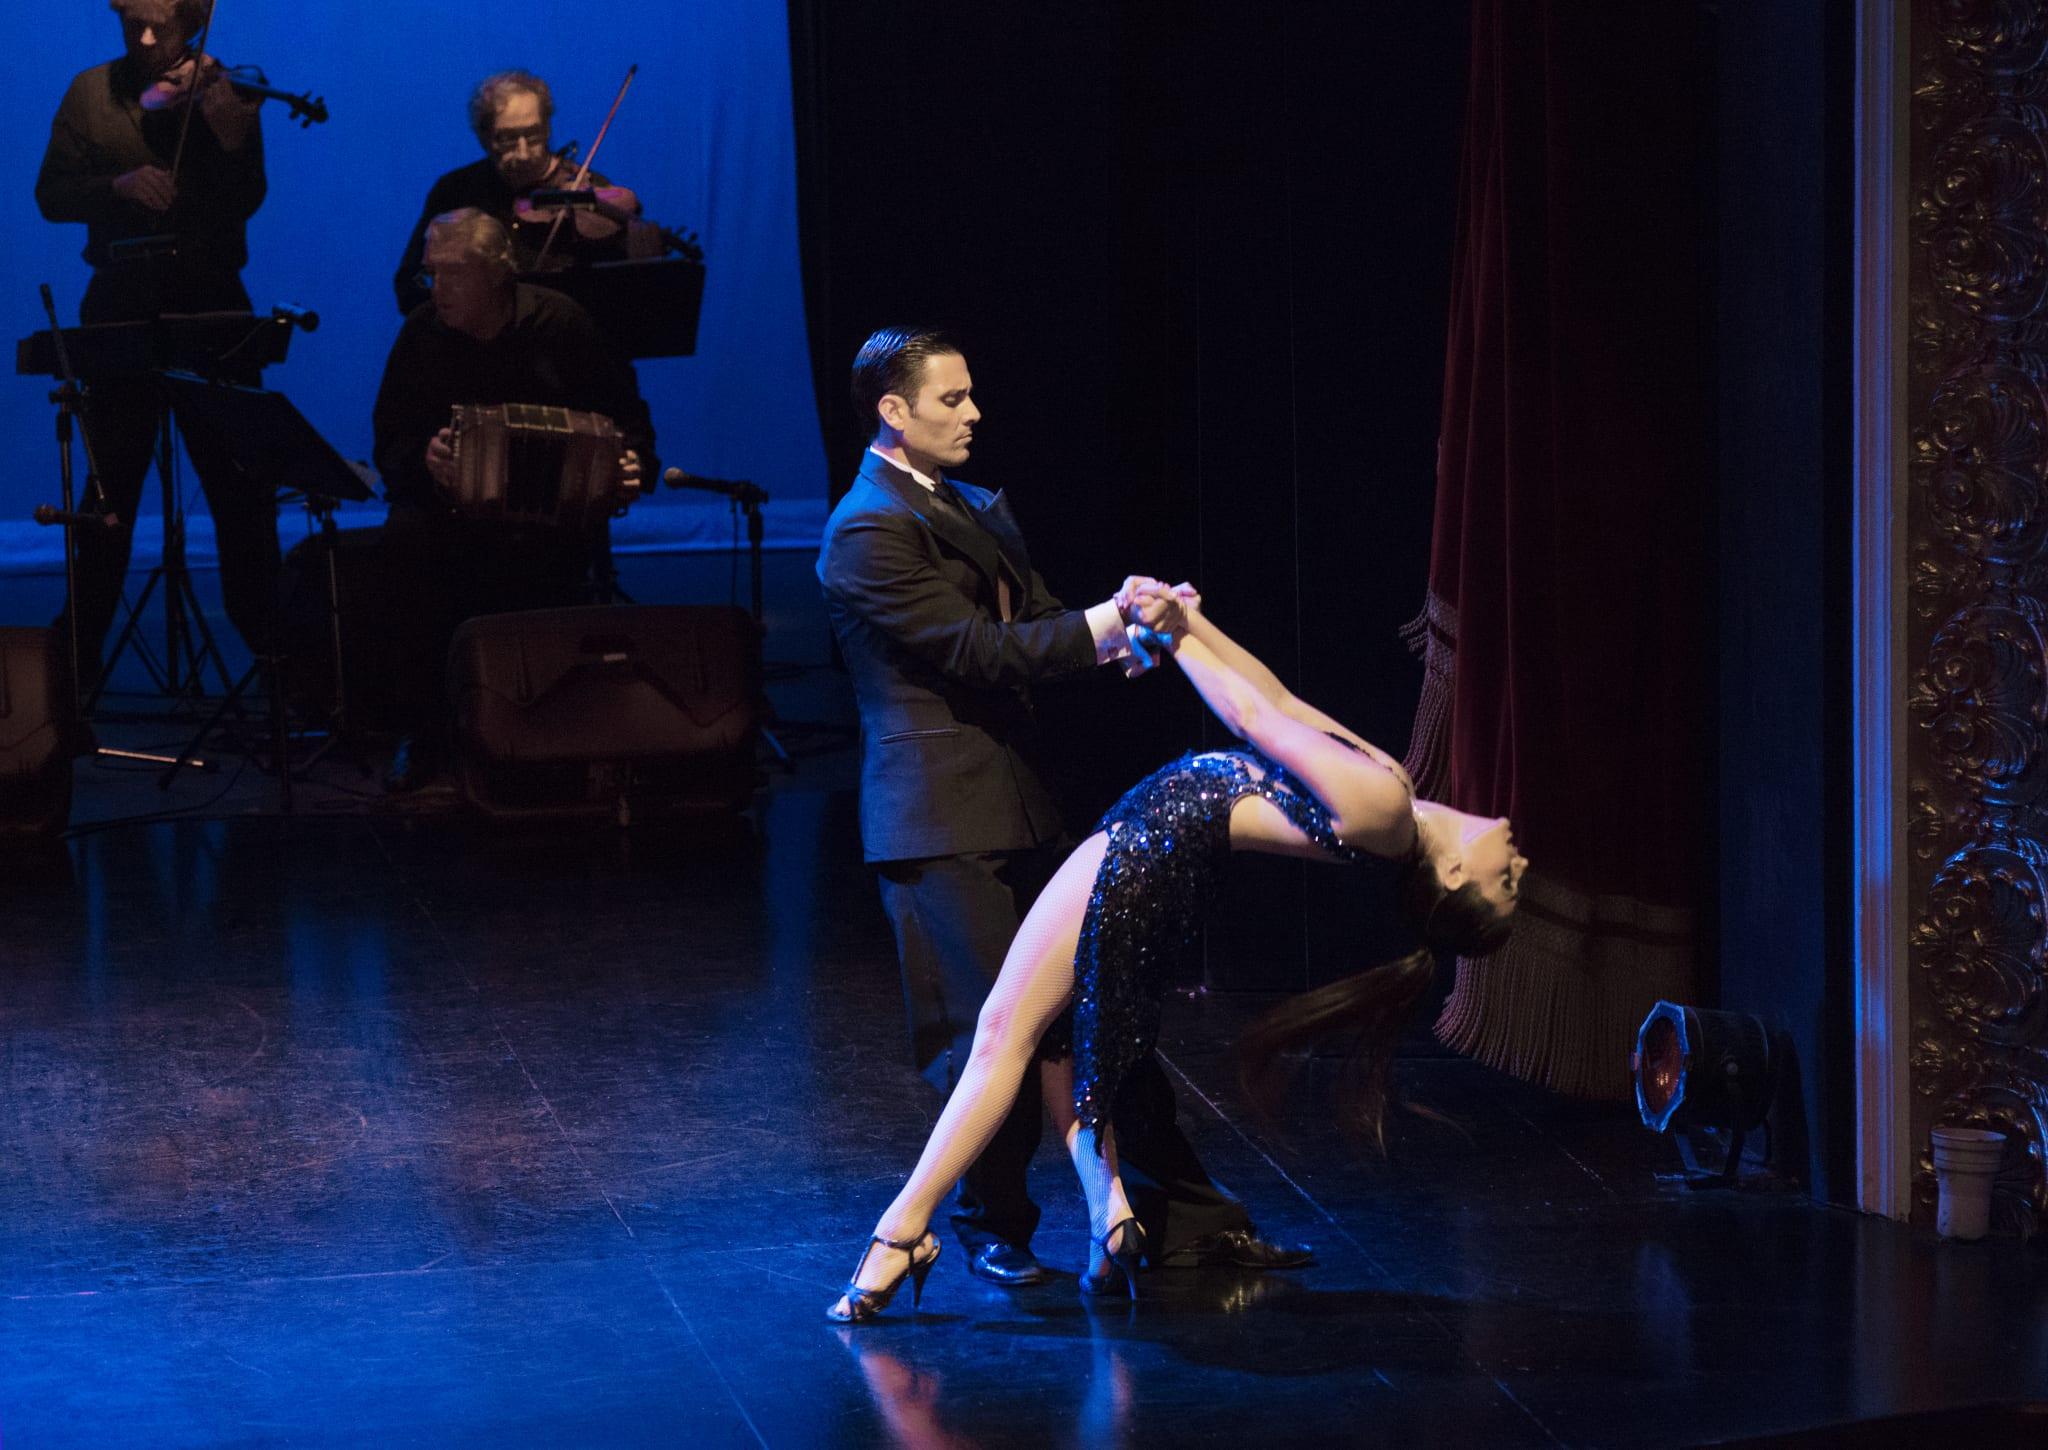 buenos aires tango spots